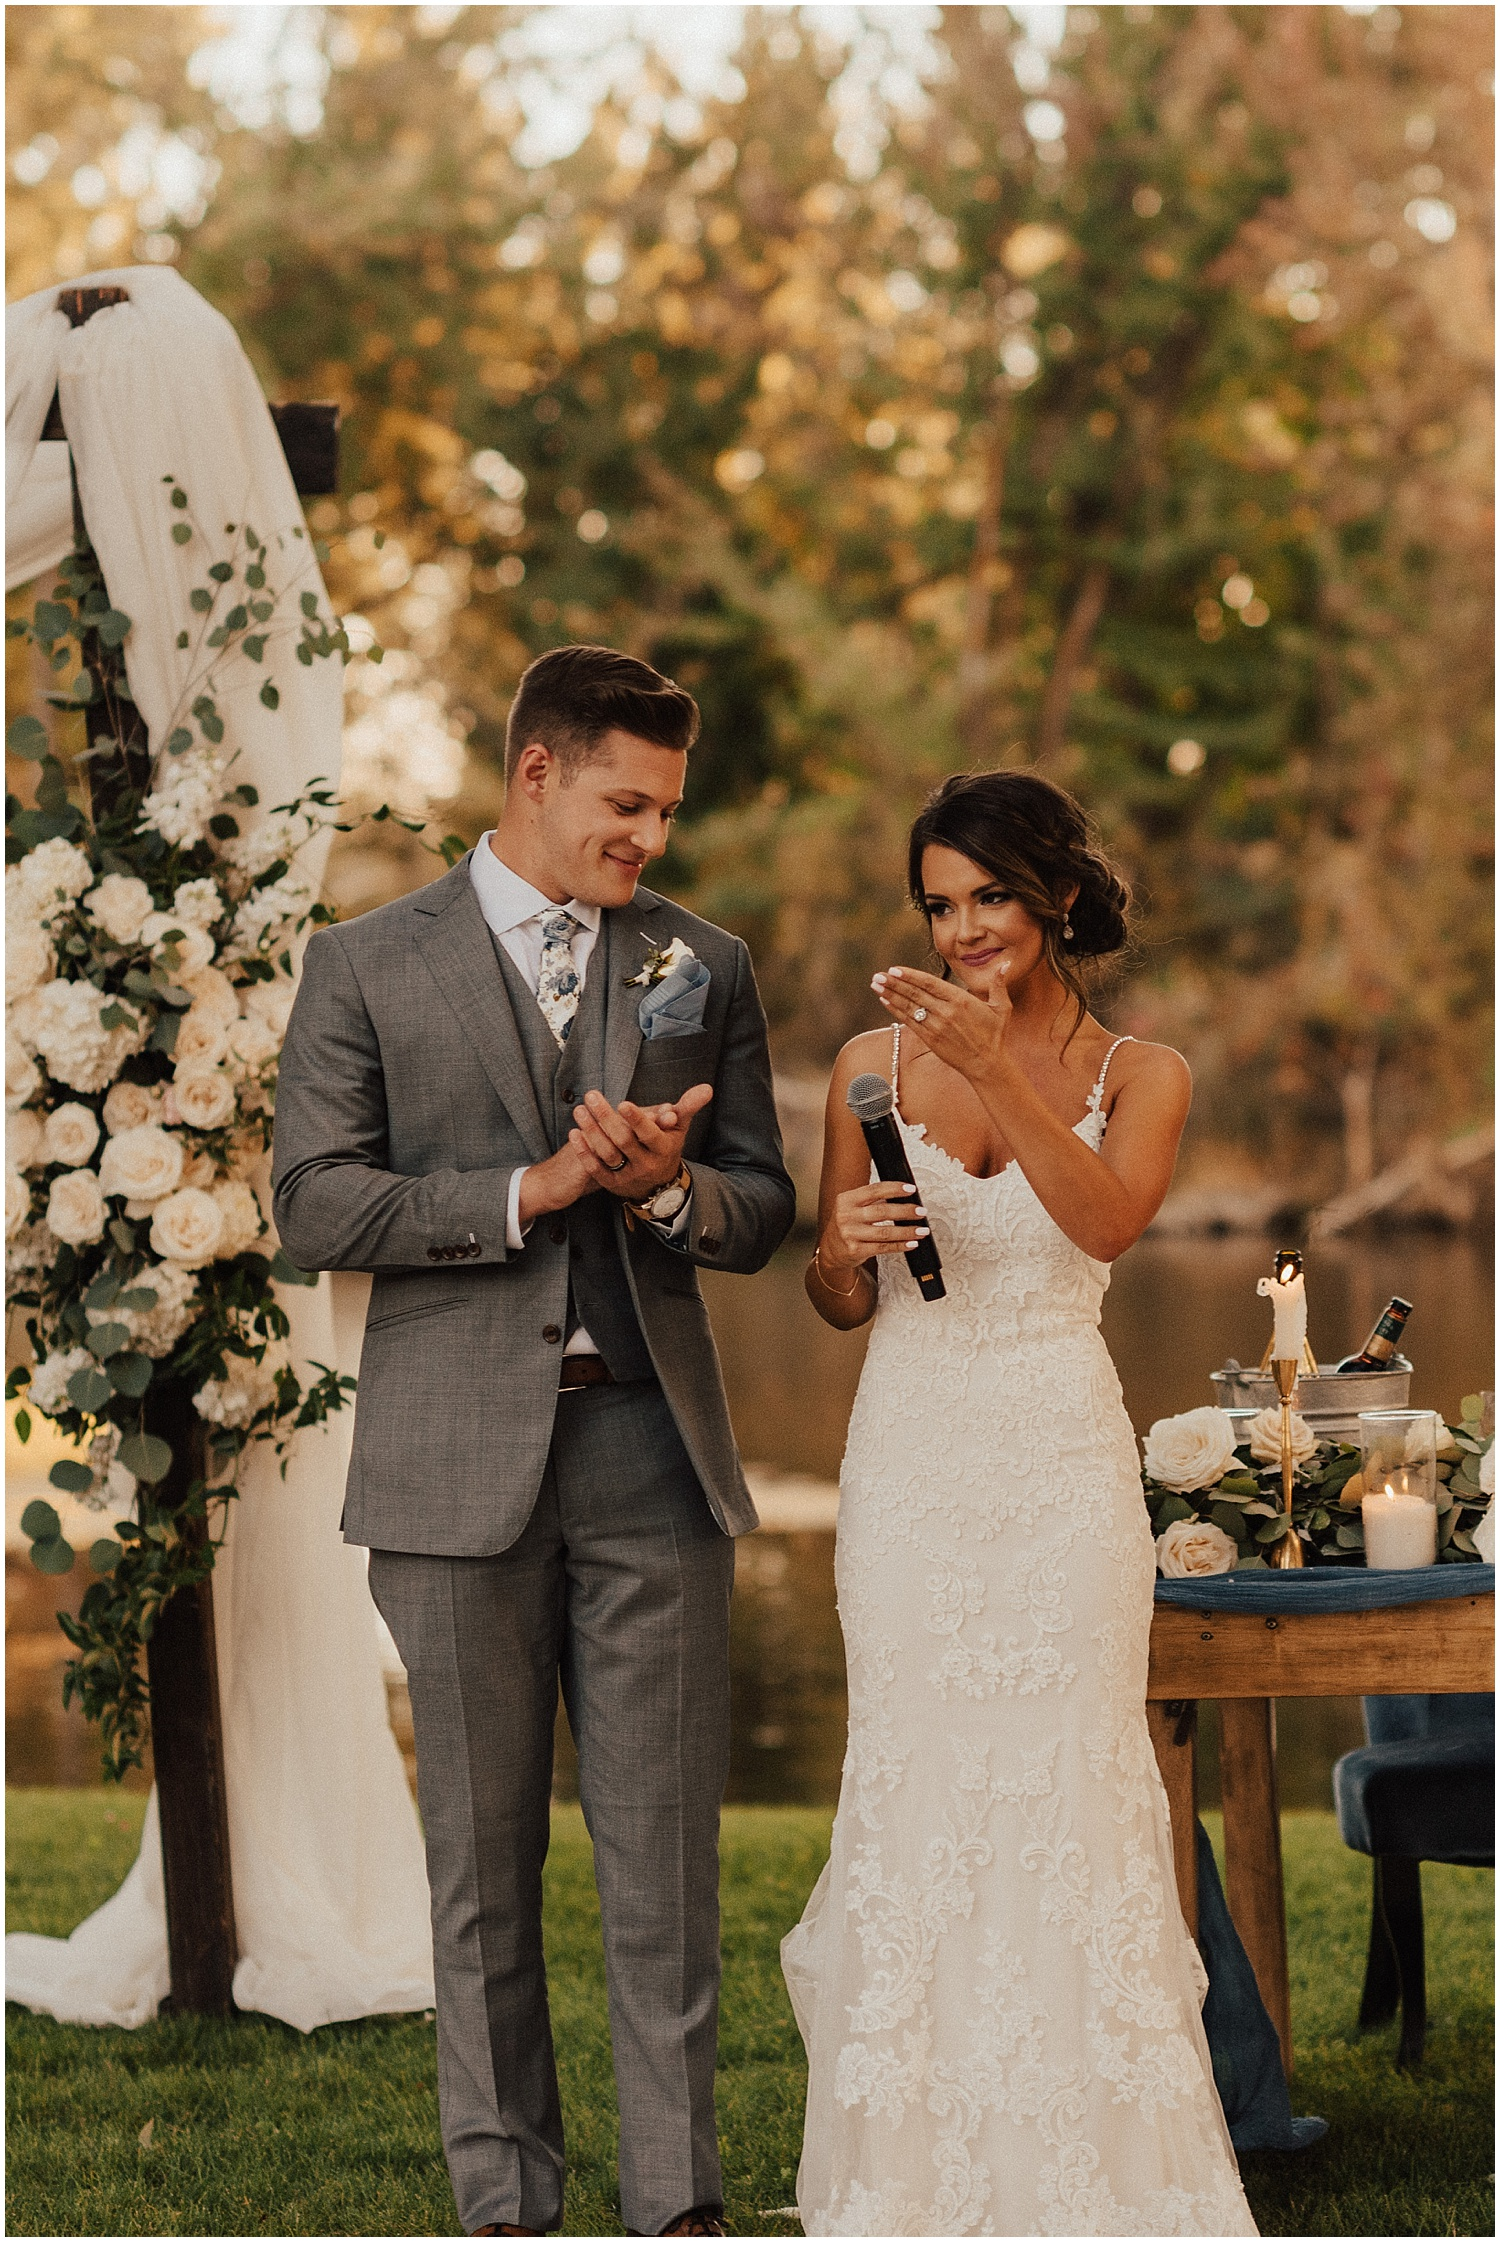 whimsical-summer-wedding-boise-idaho-las-vegas-bride196.jpg